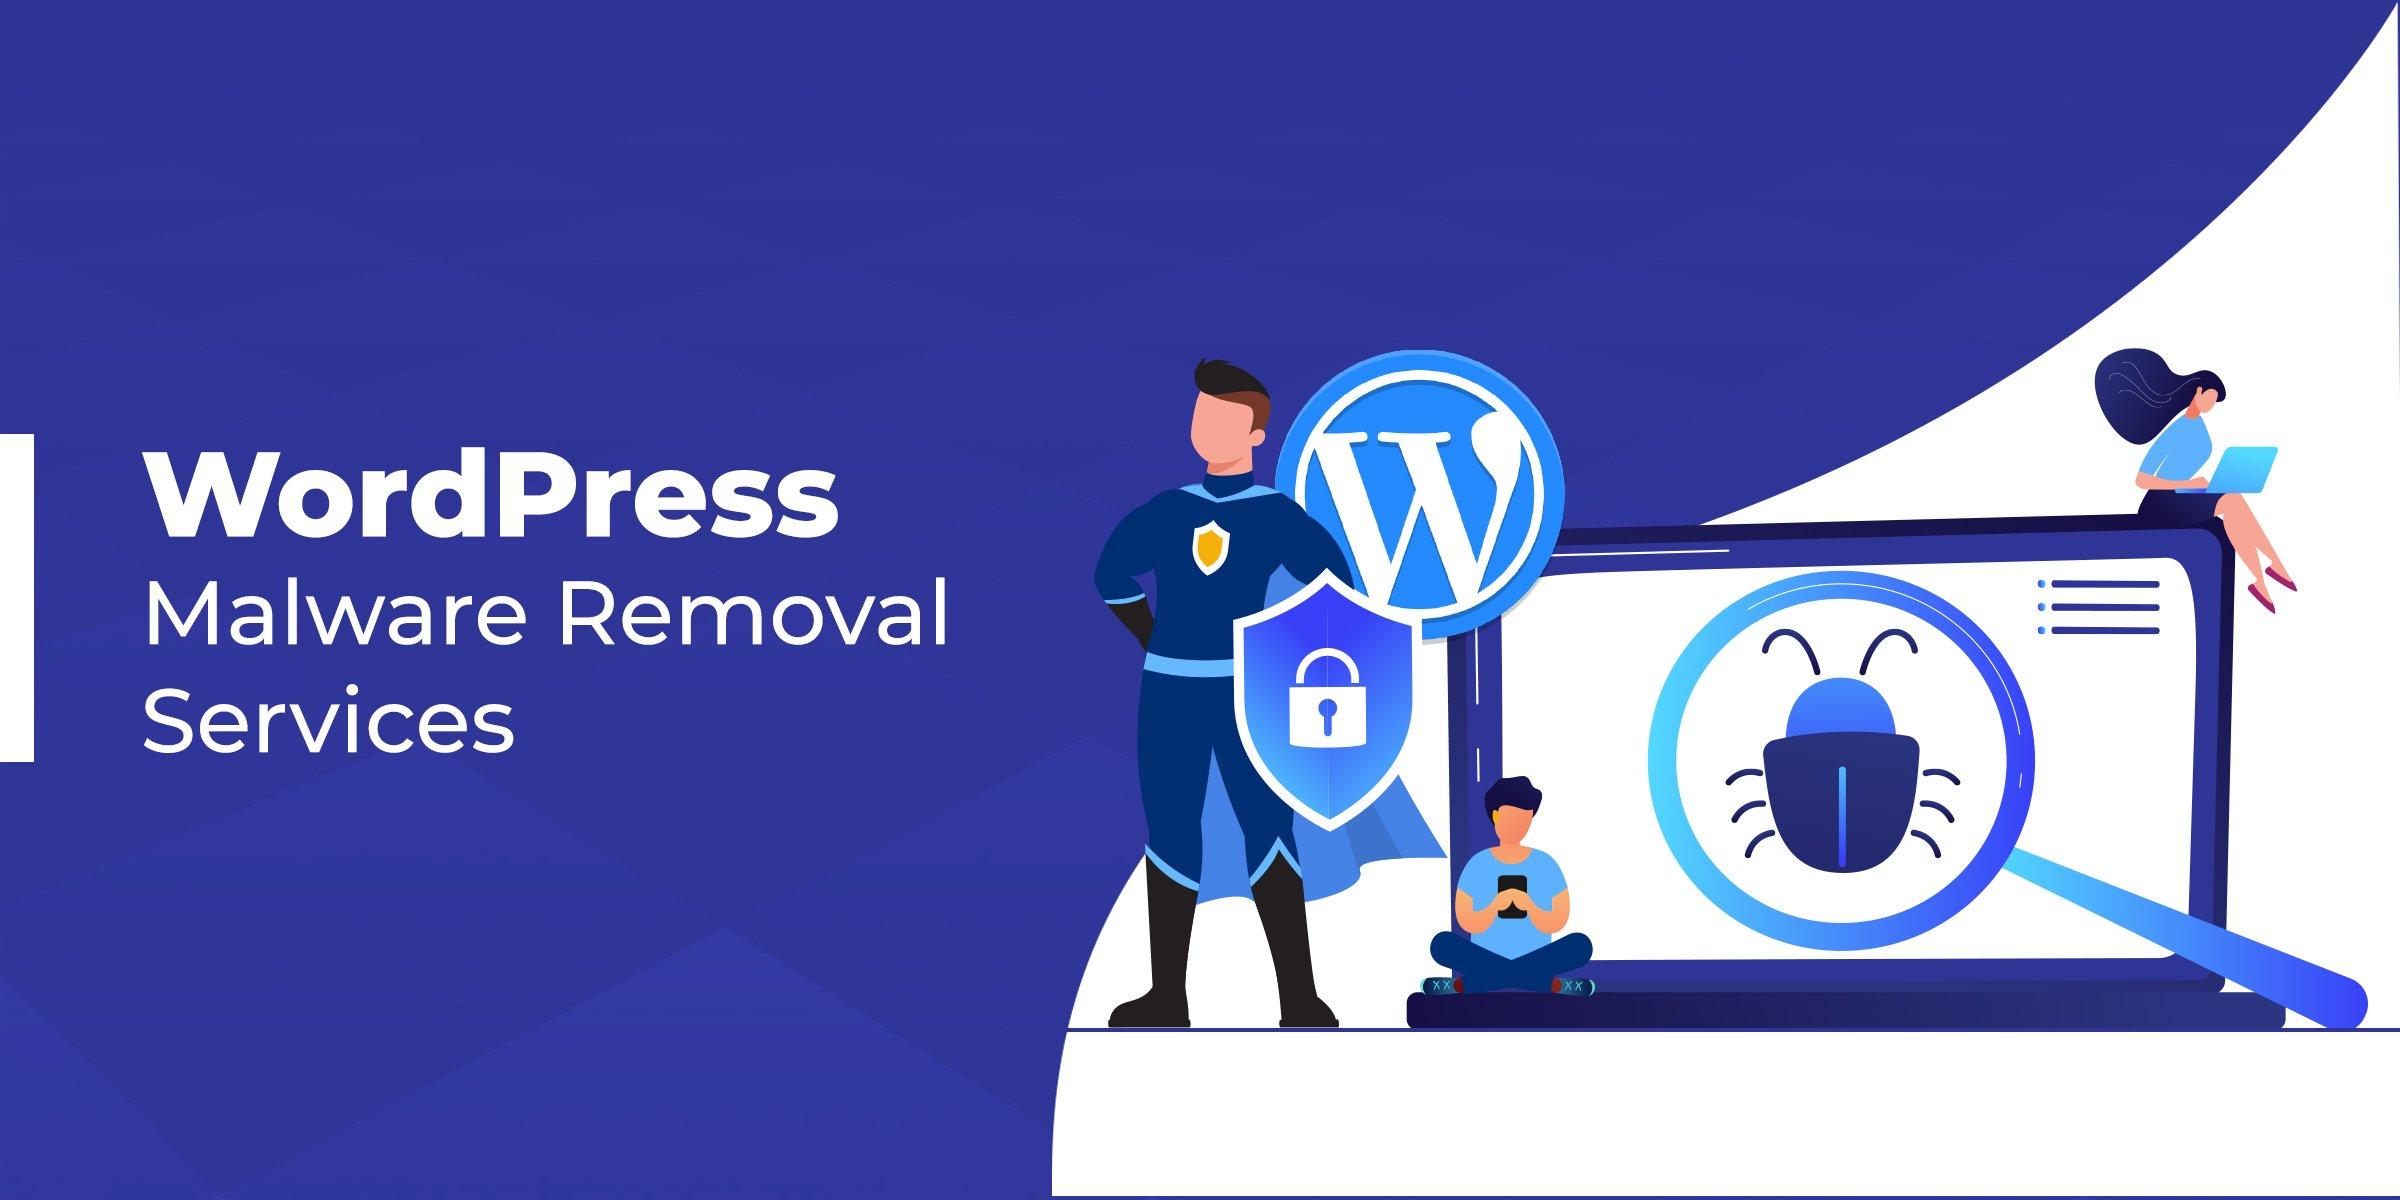 WordPress Malware Removal Services